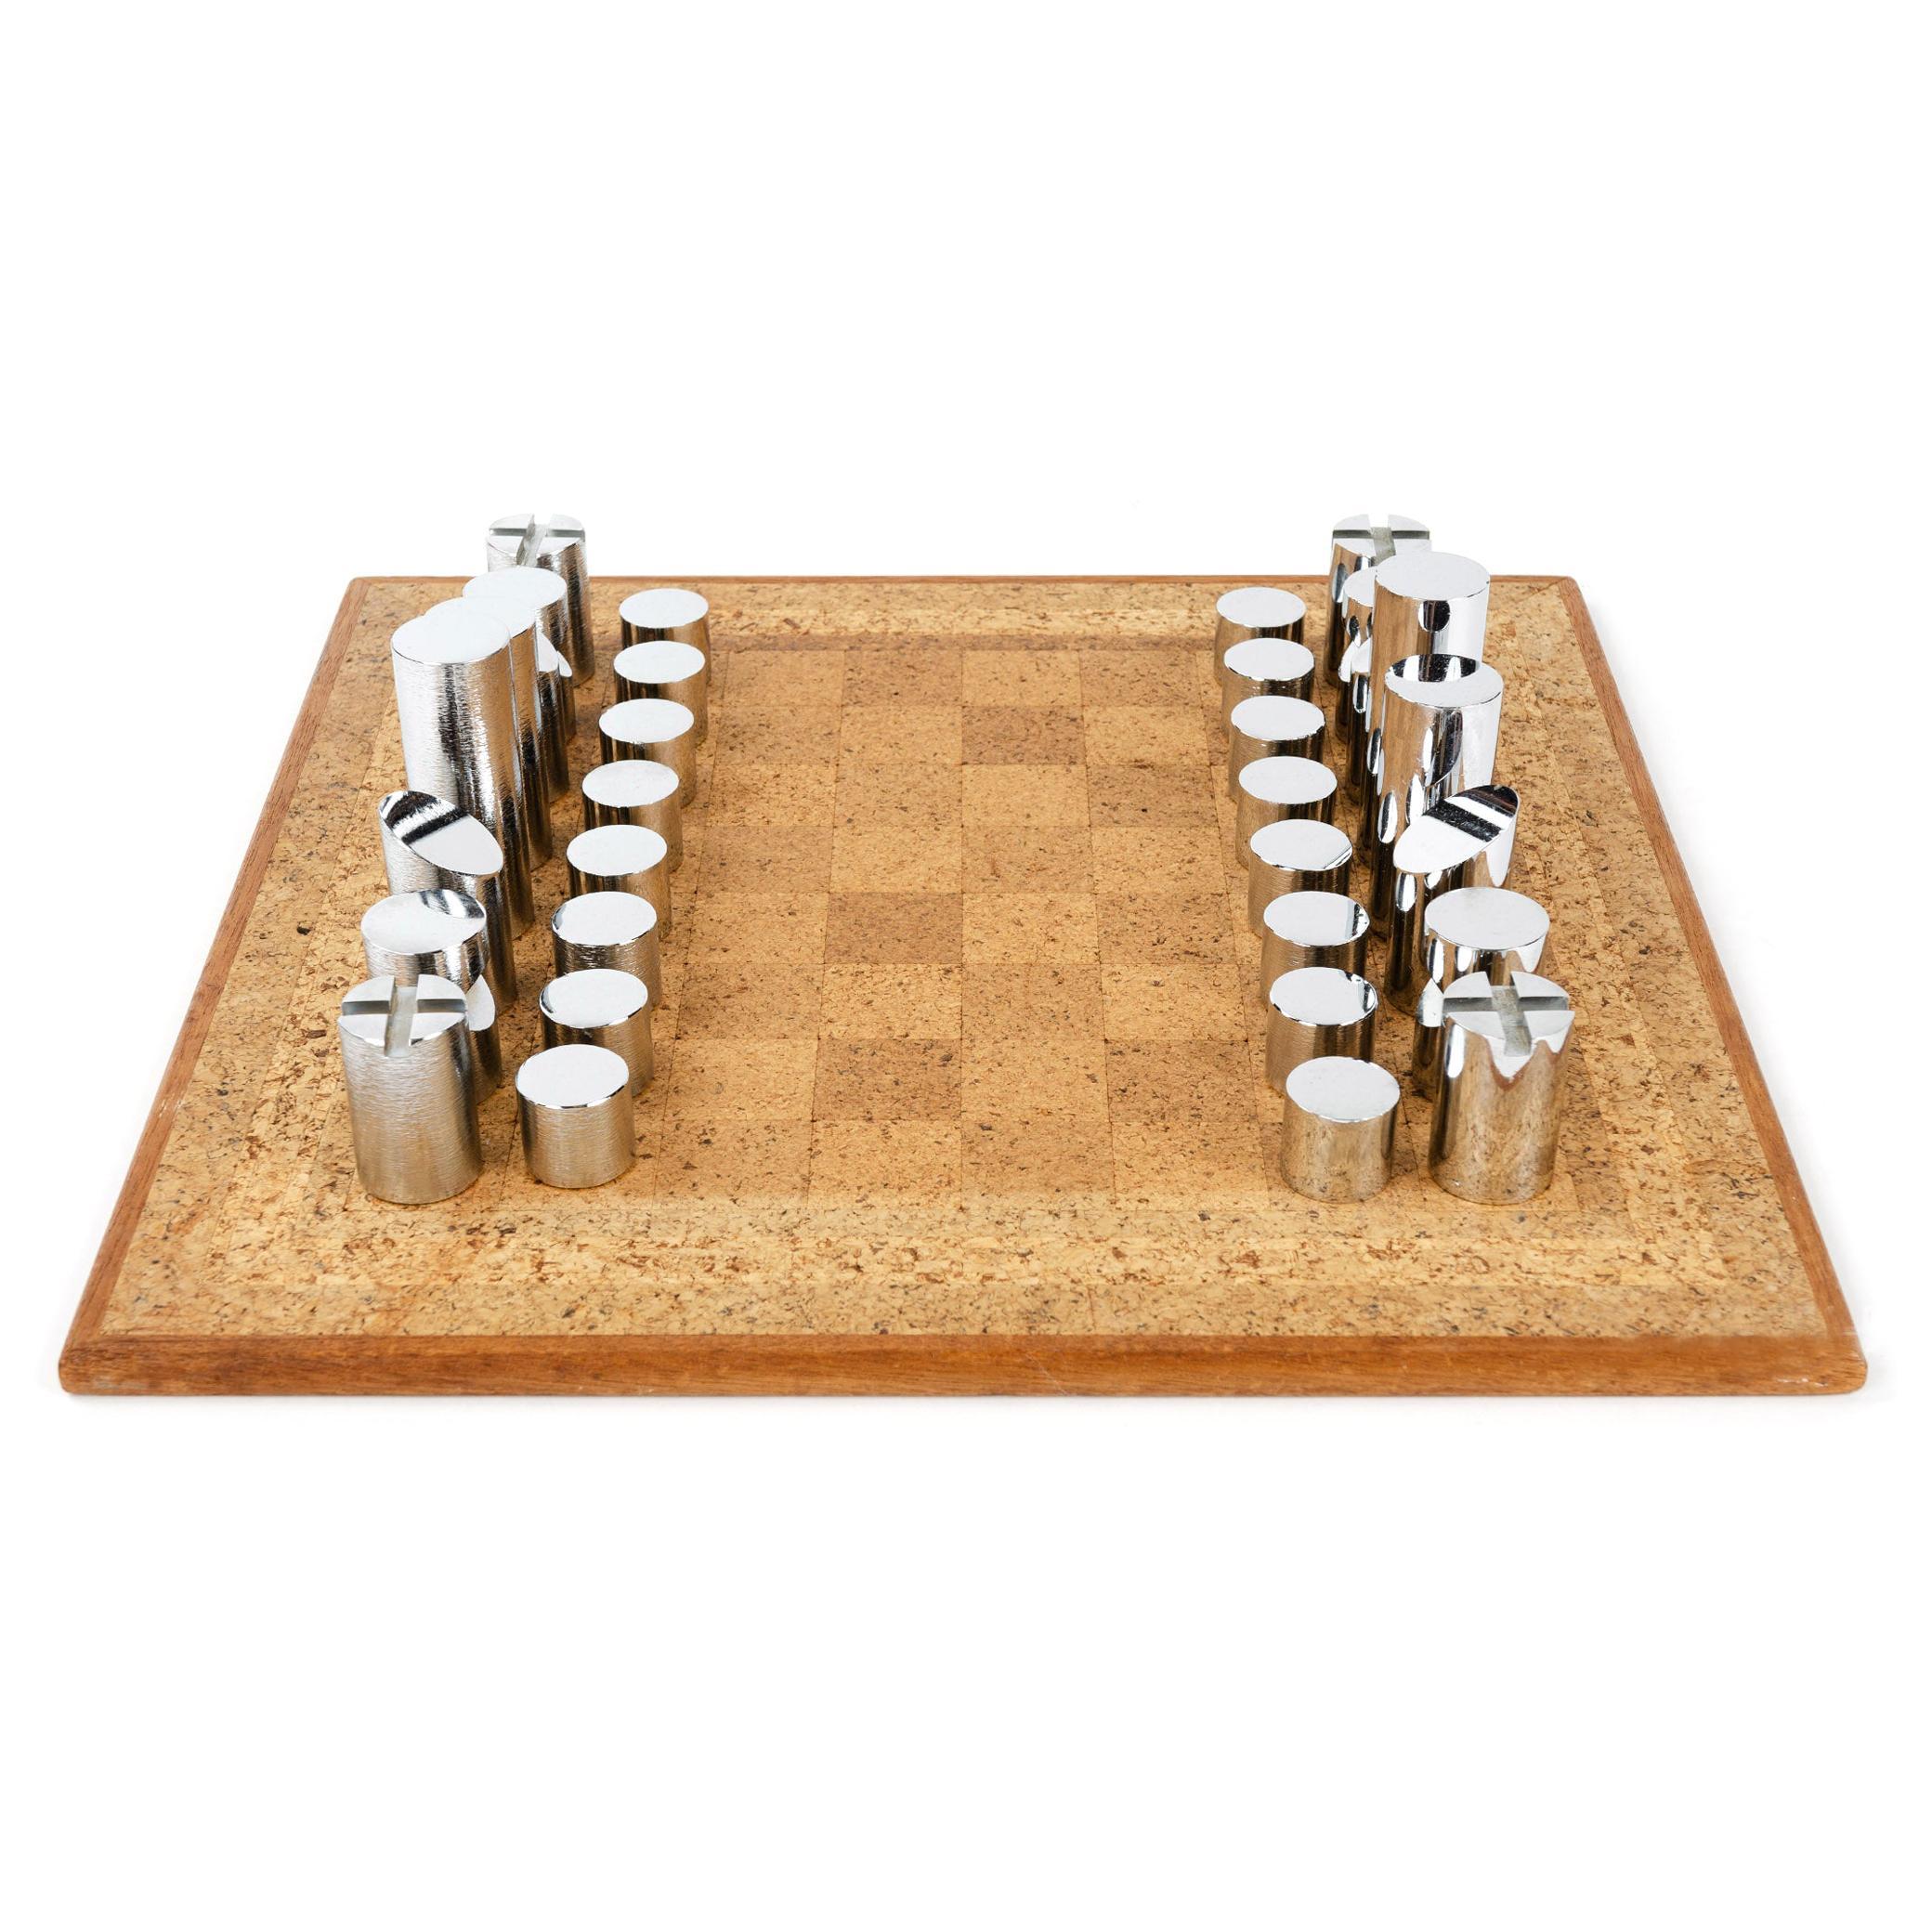 1950s Modernist Chess Set